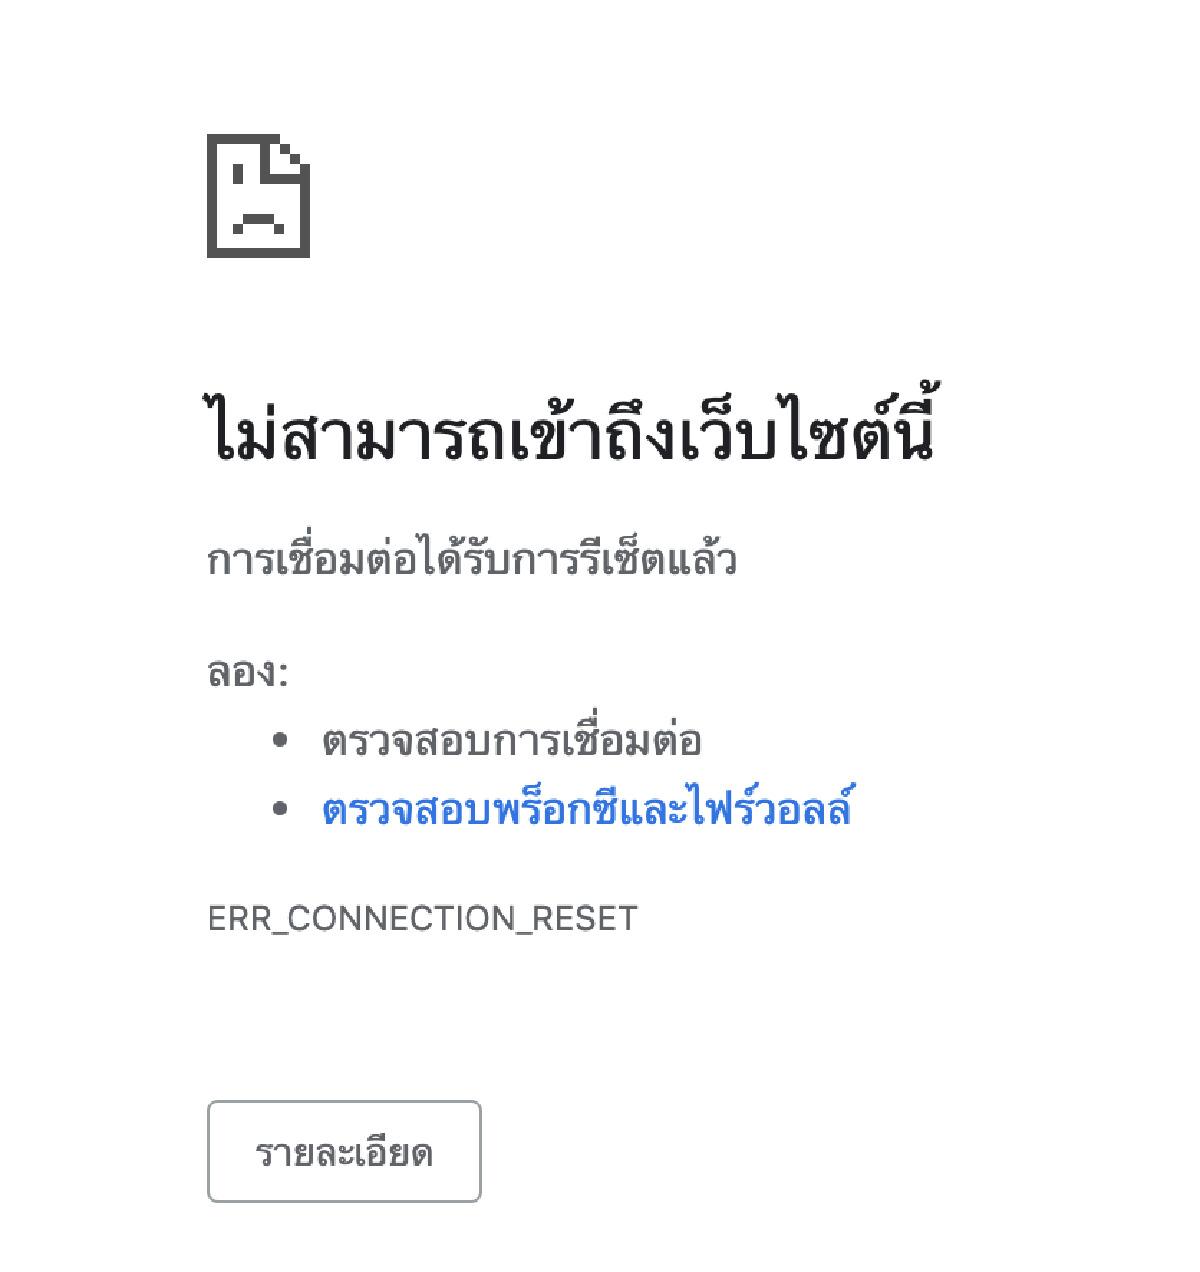 www.sso.go.th ล่ม คนแห่เช็คสิทธิ์ รับ 5,000